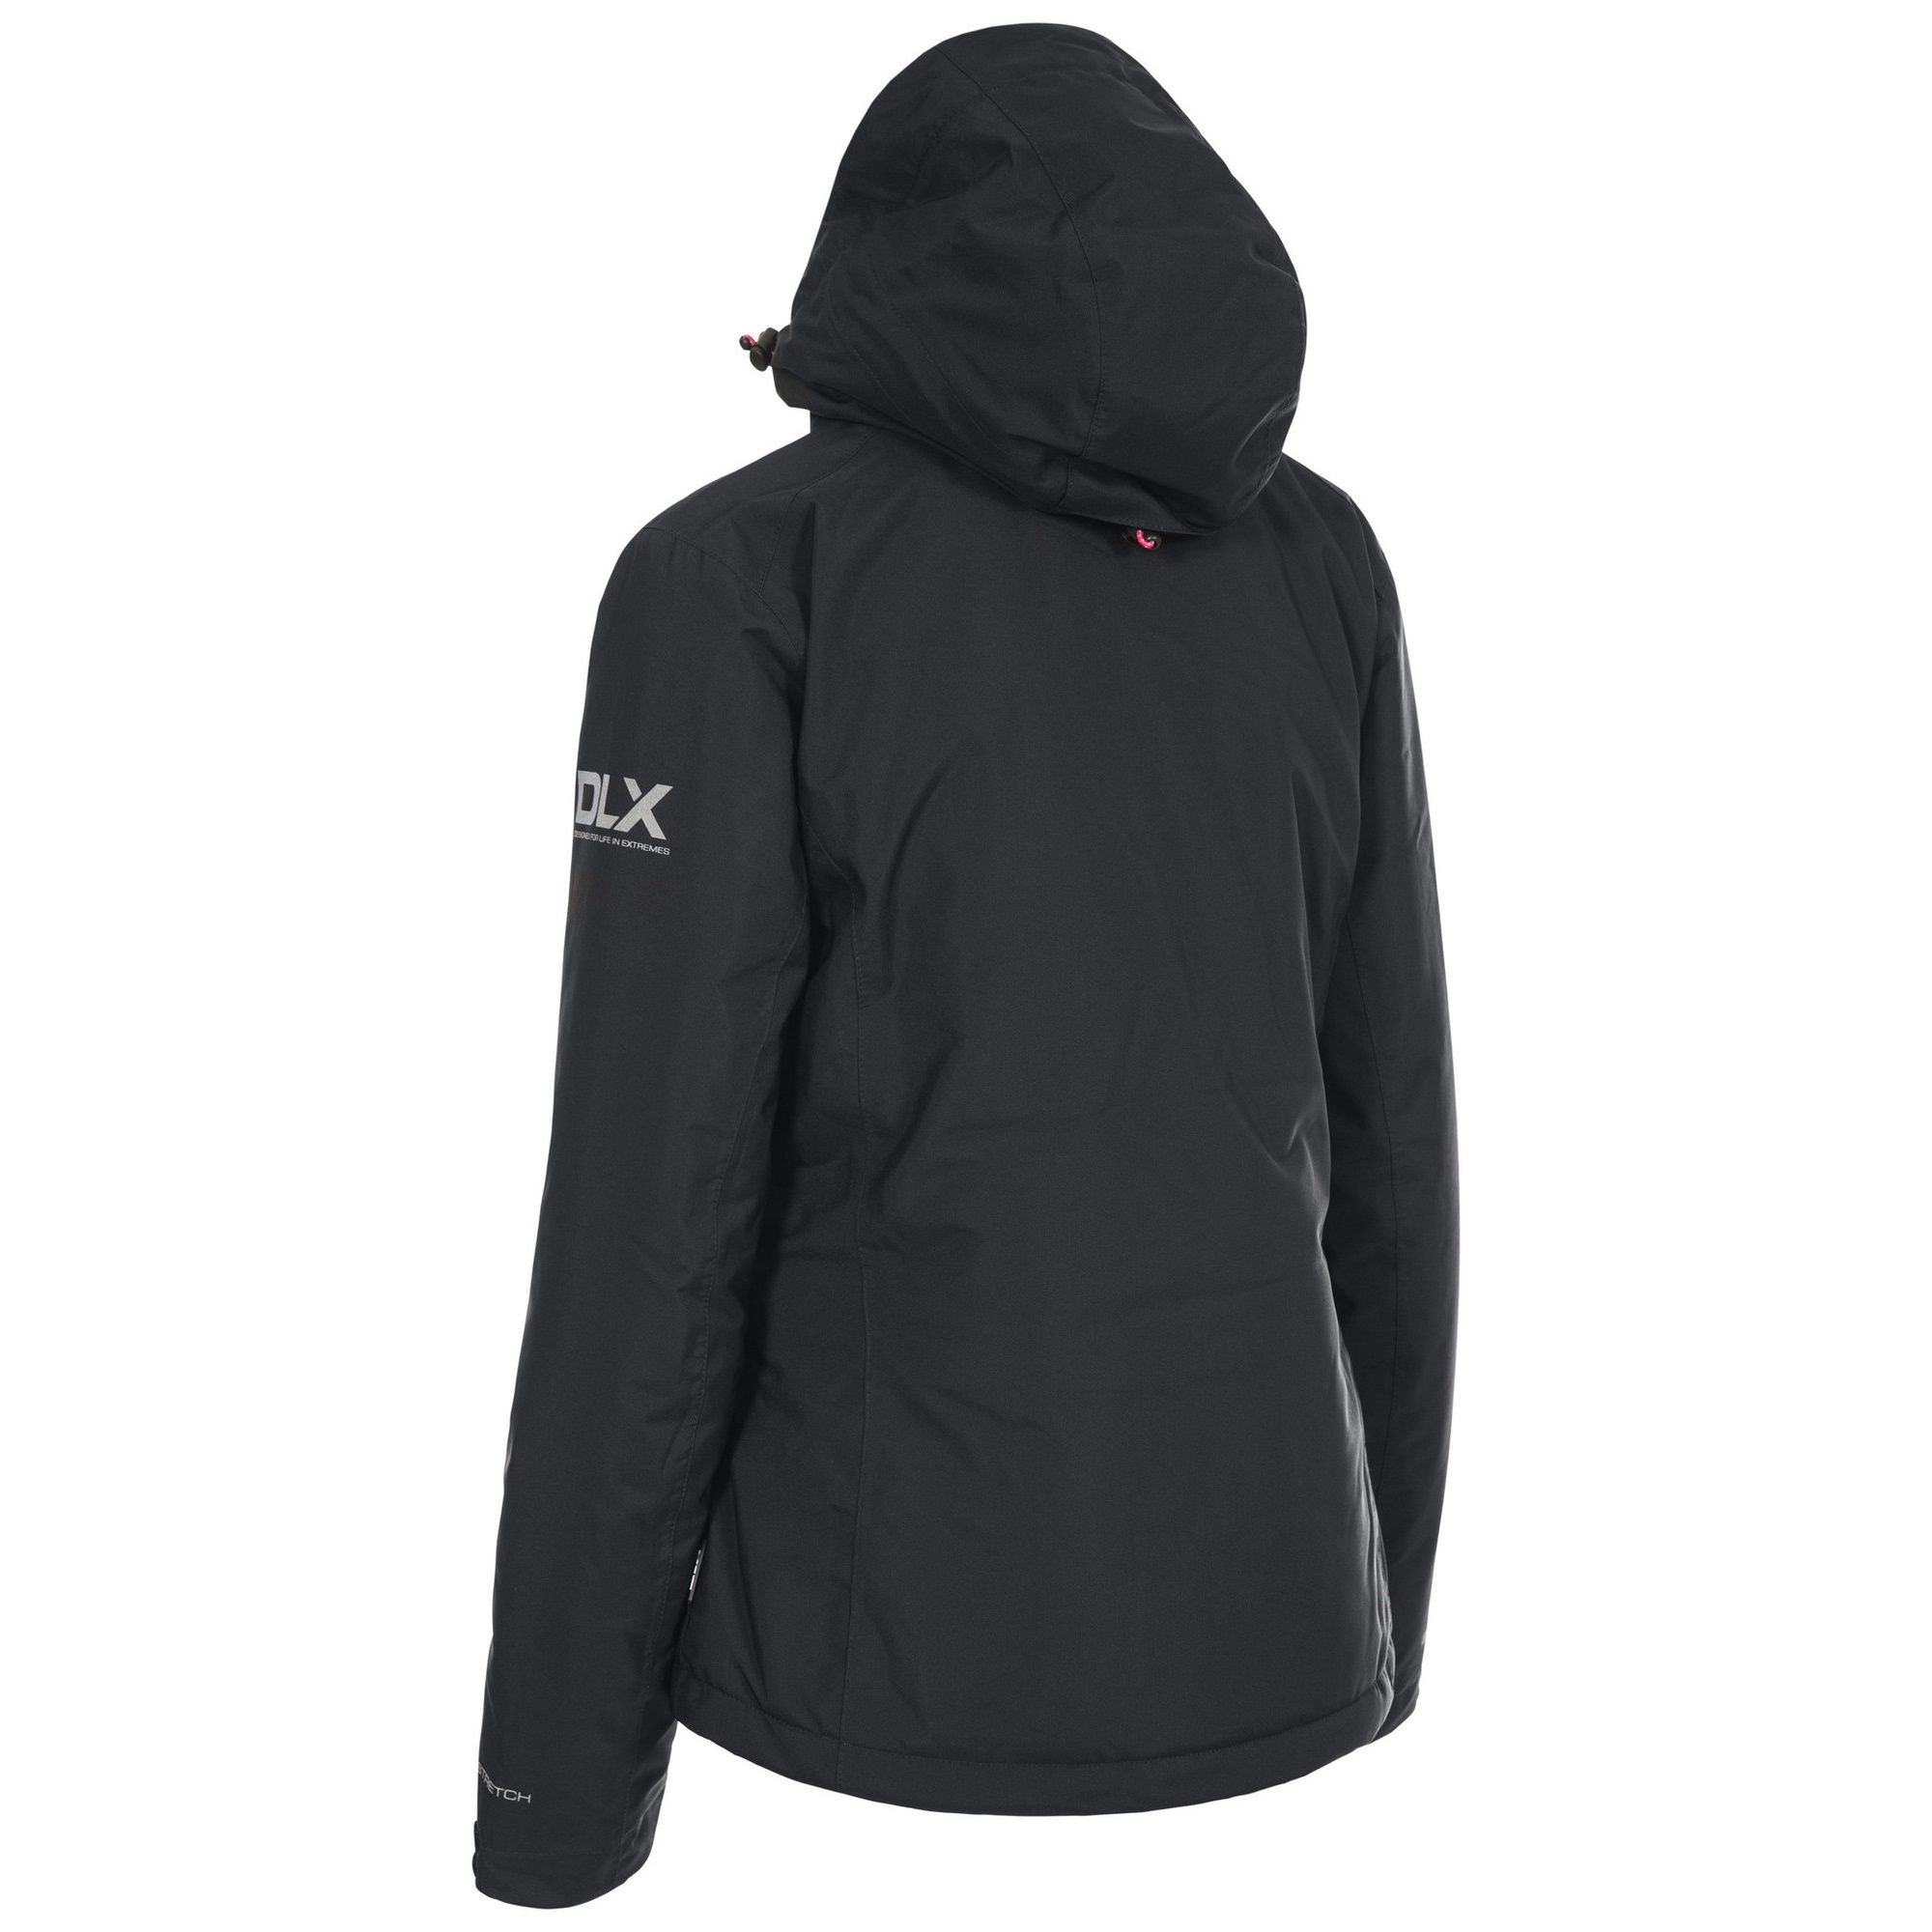 Trespass Womens/Ladies Hildy Waterproof DLX Ski Jacket (Raspberry)